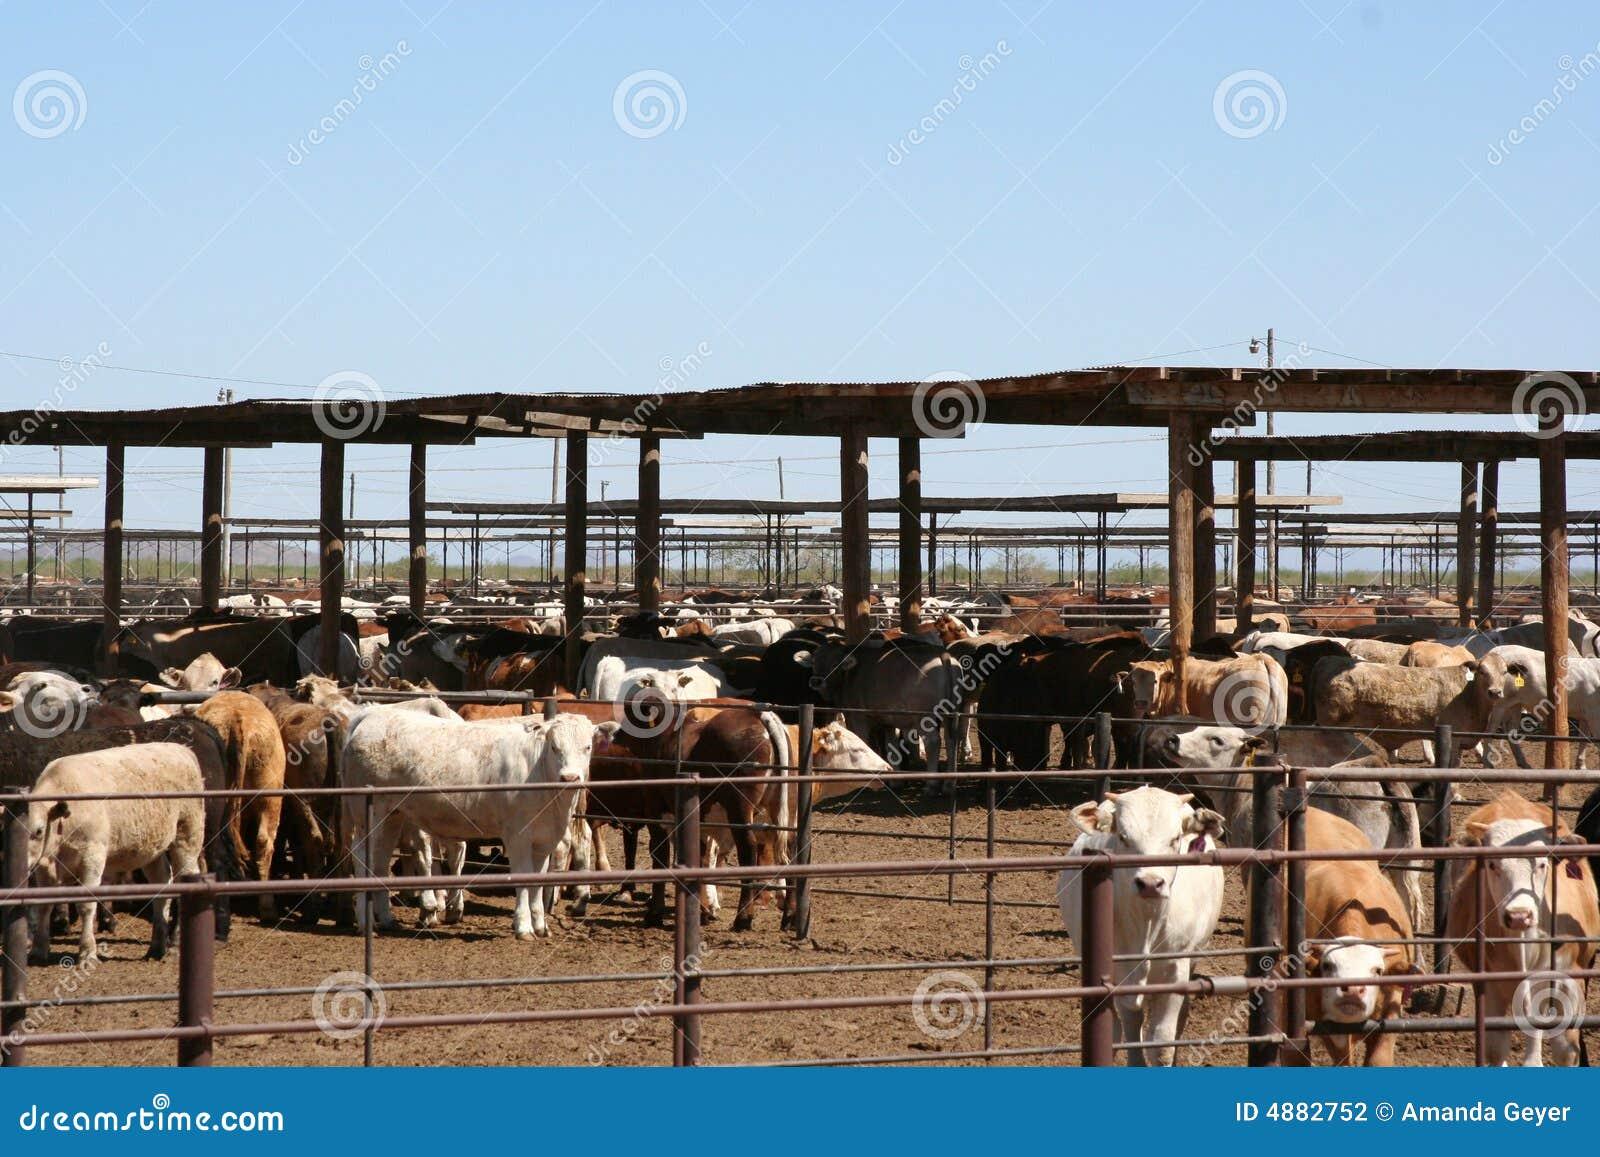 Cattle Farm Business Plan